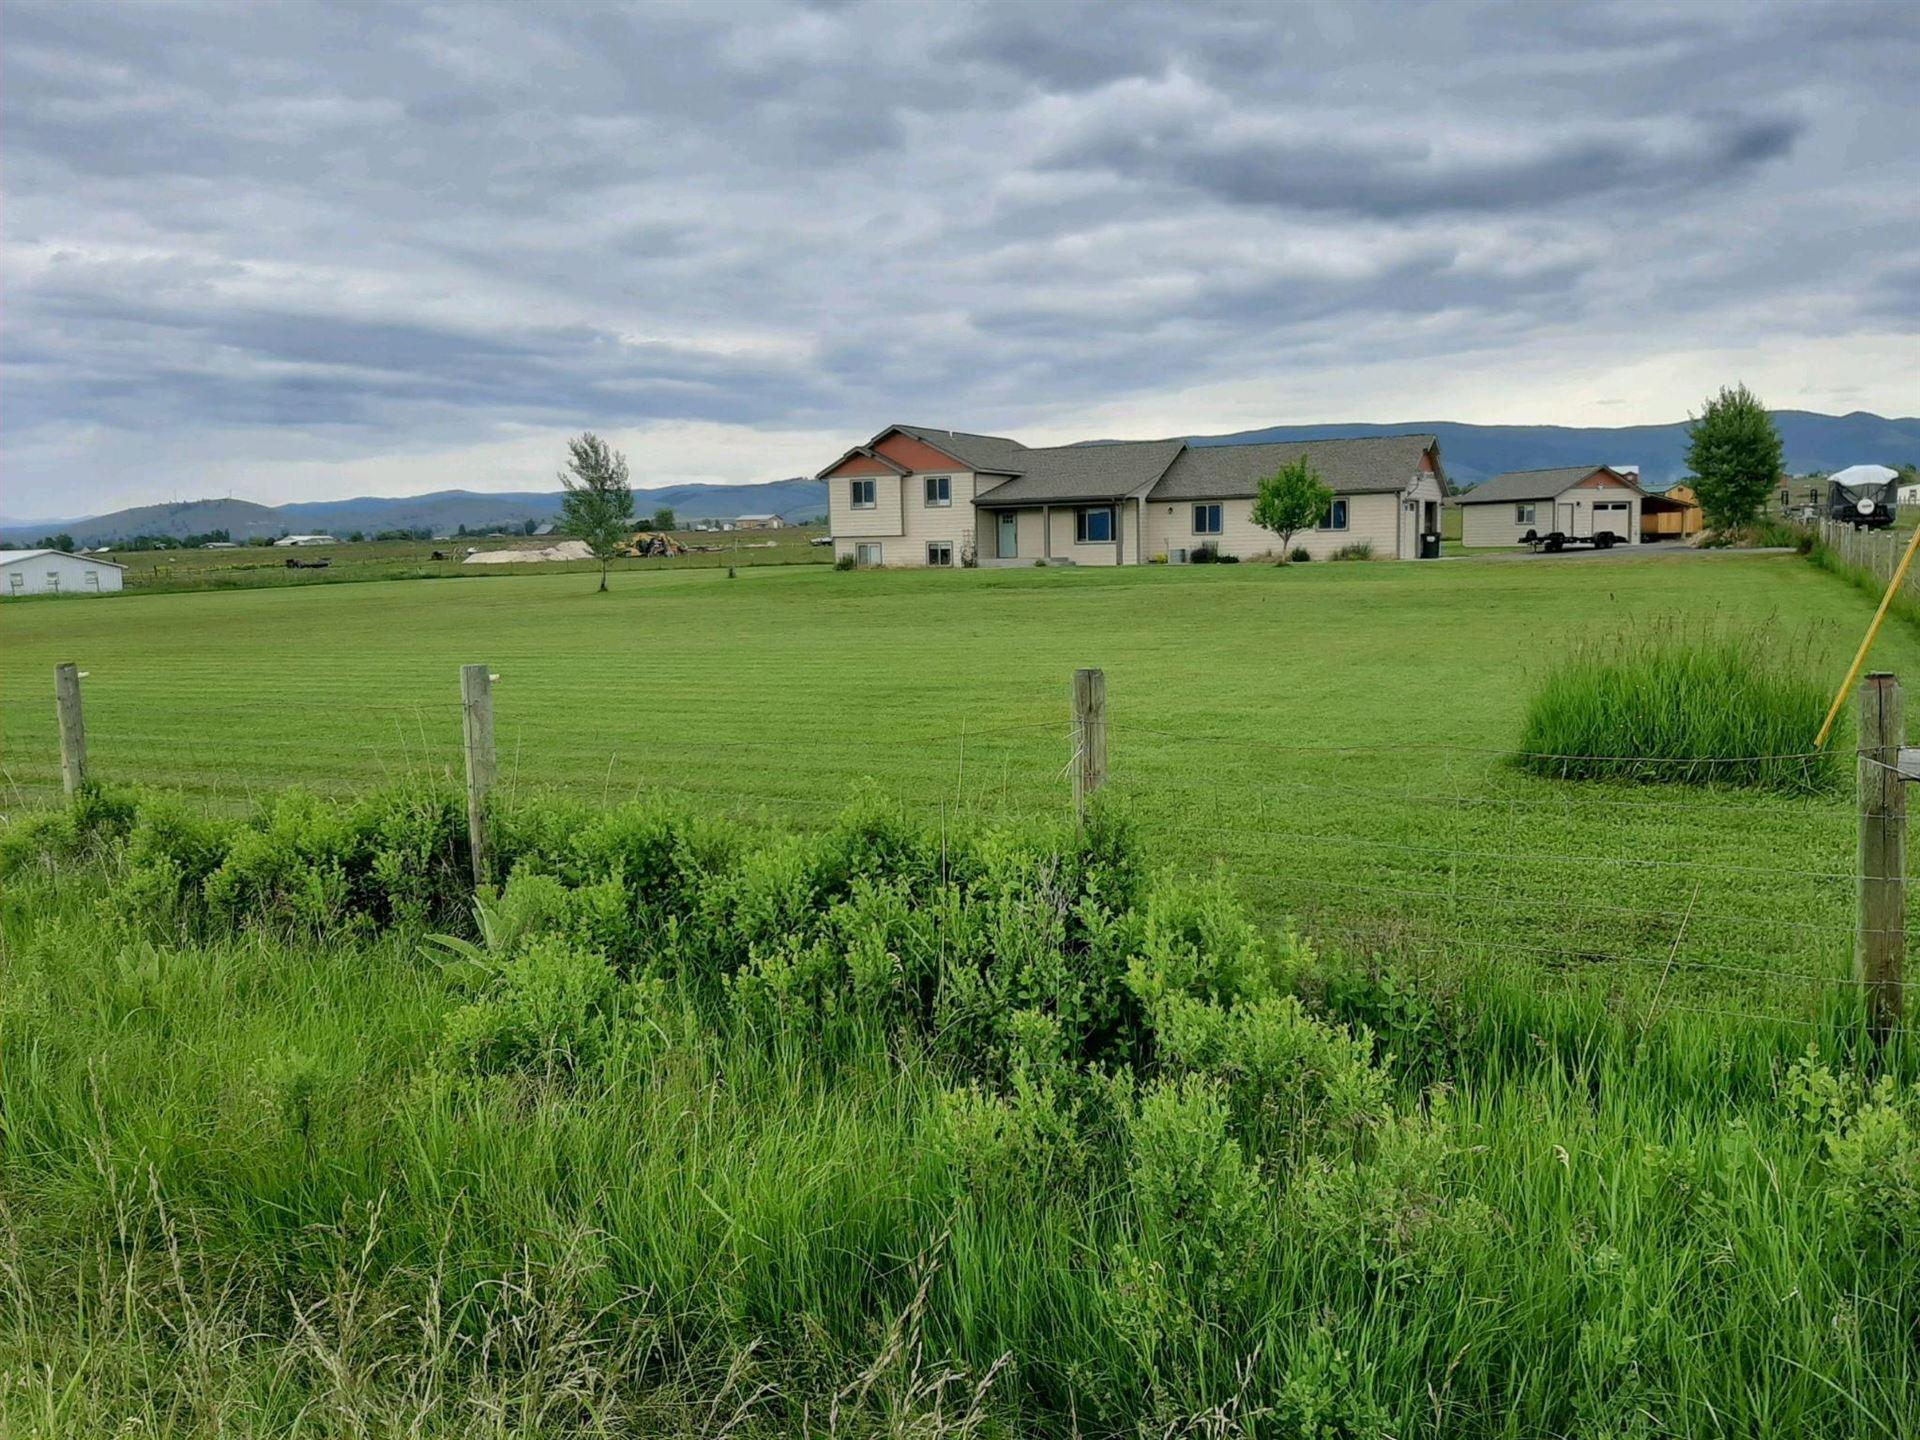 Photo of 948 Pine Hollow Road, Stevensville, MT 59870 (MLS # 22019271)